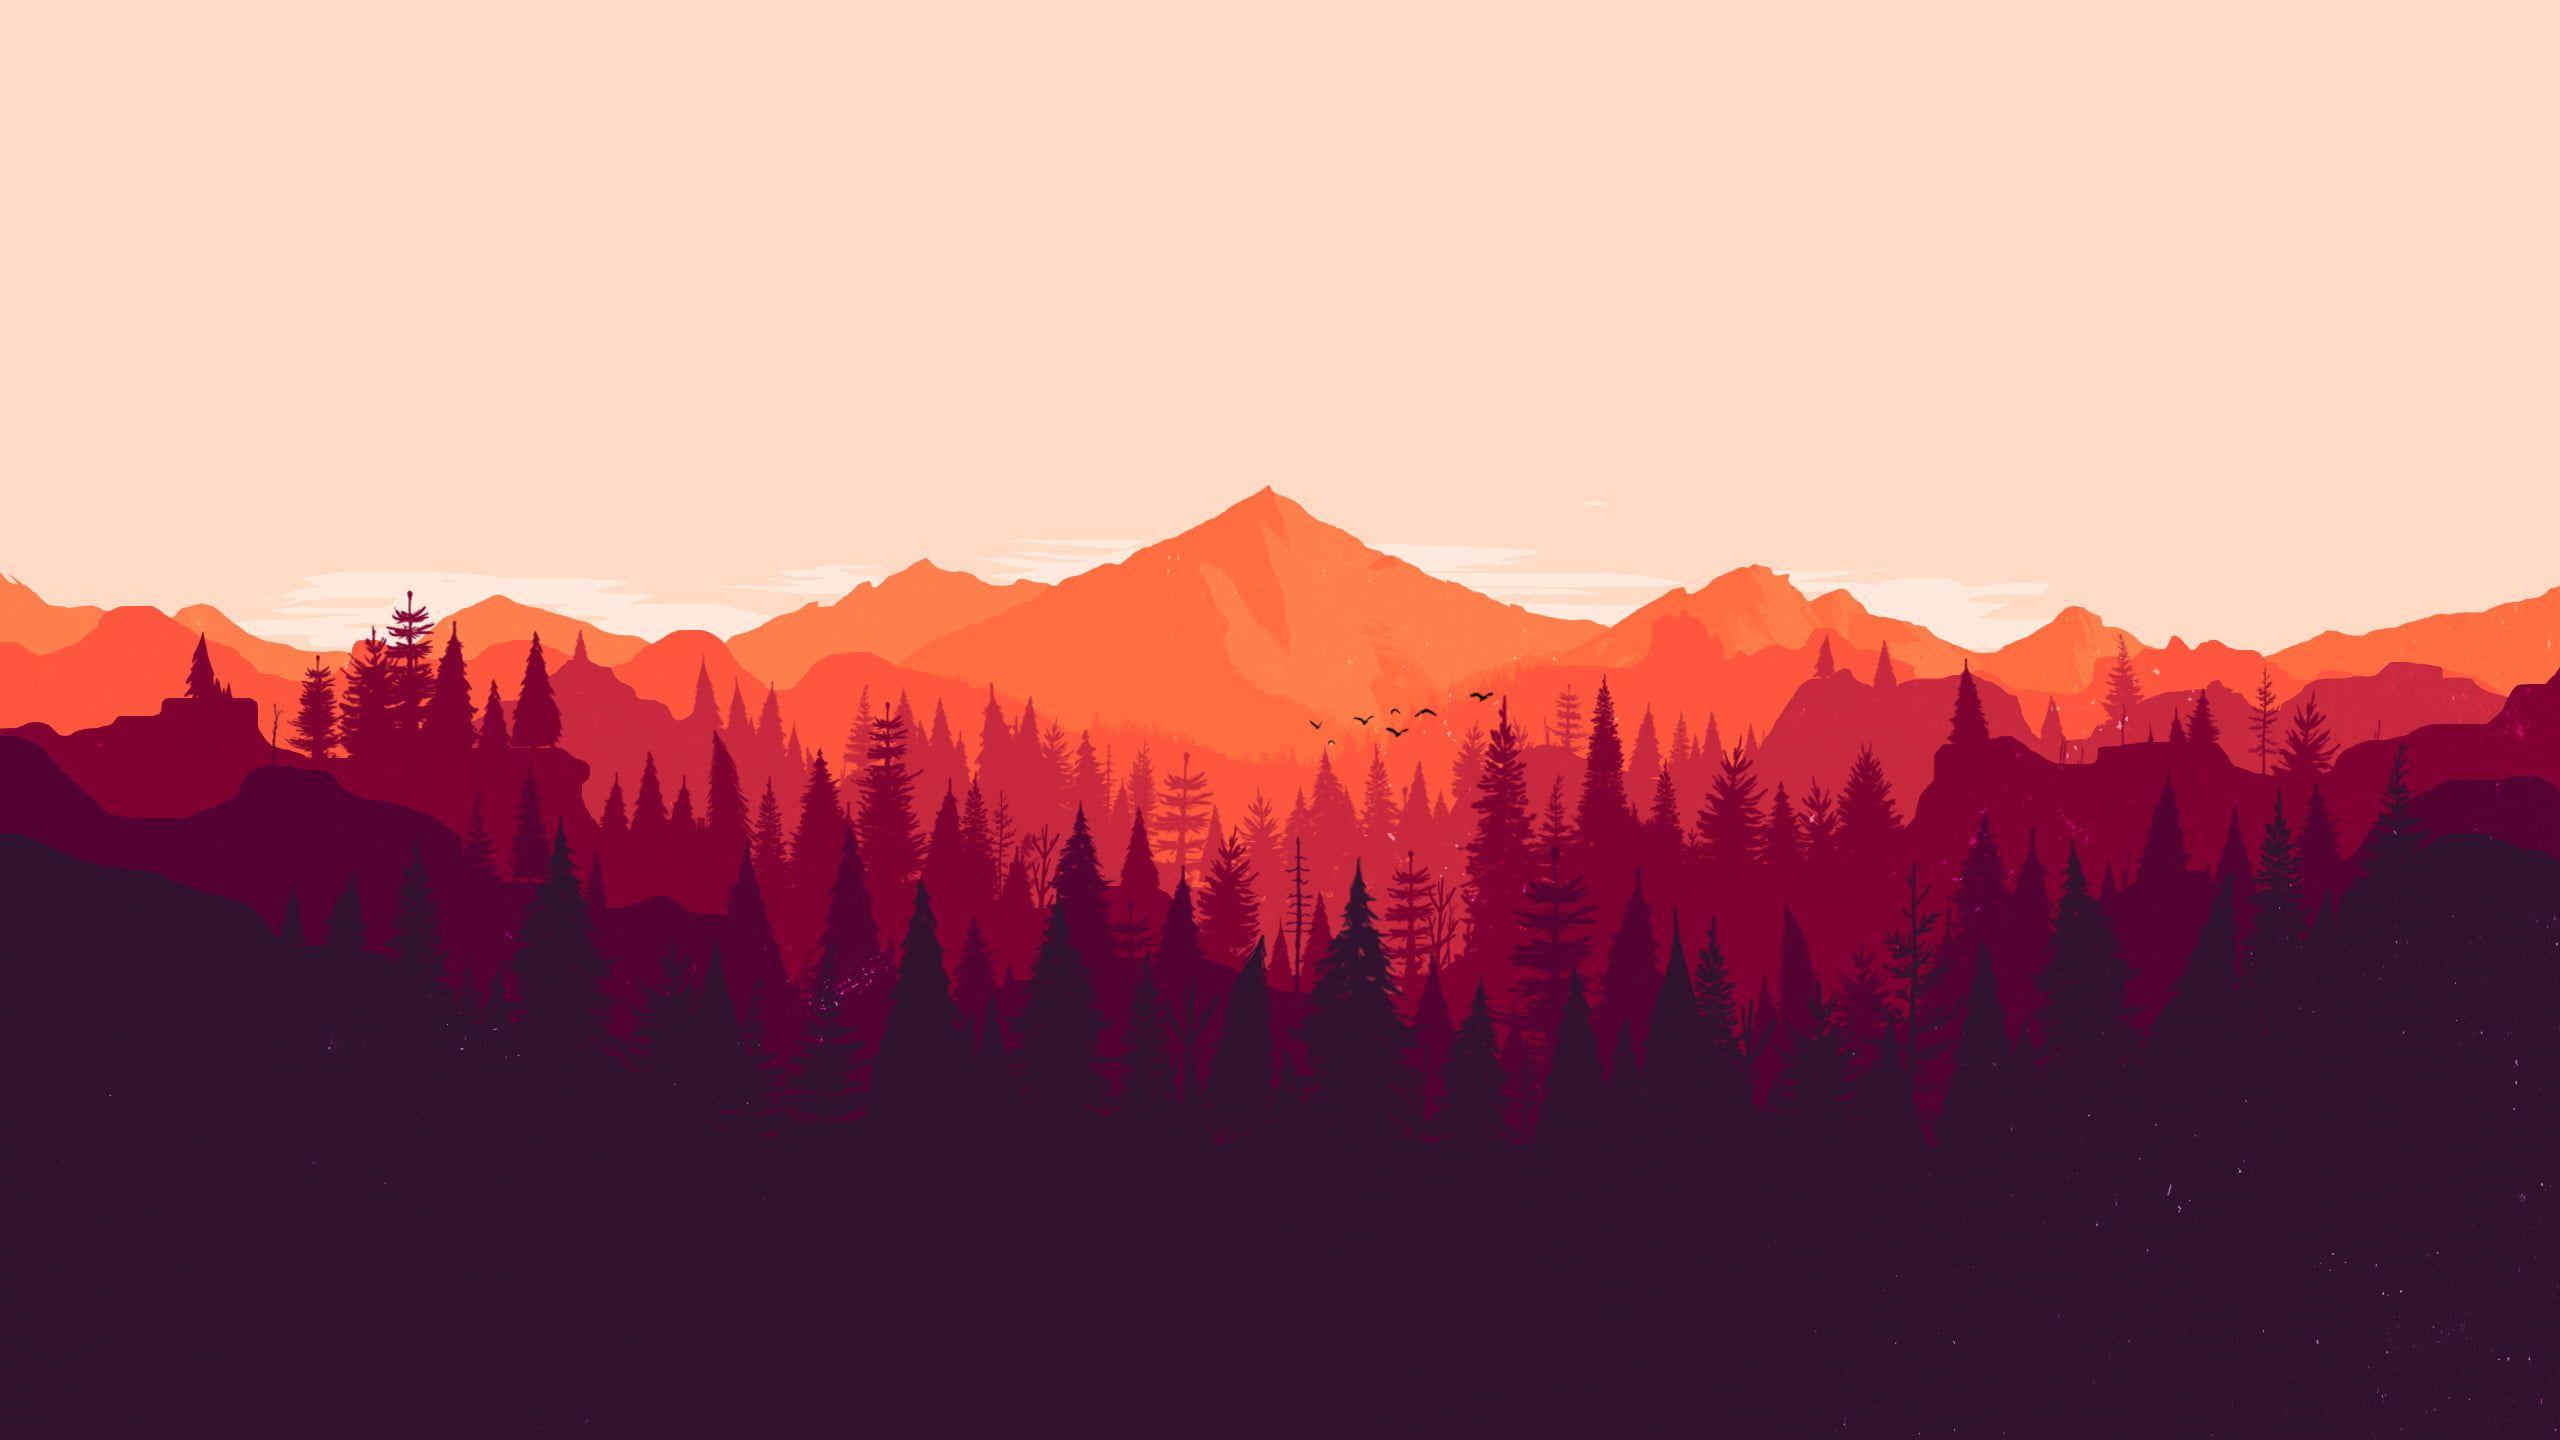 Silhouette Of Trees Forest Firewatch Minimalism Orange Red Pine Trees 2k Wallpaper Hdwallpaper Desktop Firewatch 4k Wallpaper 3840x2160 Wallpaper